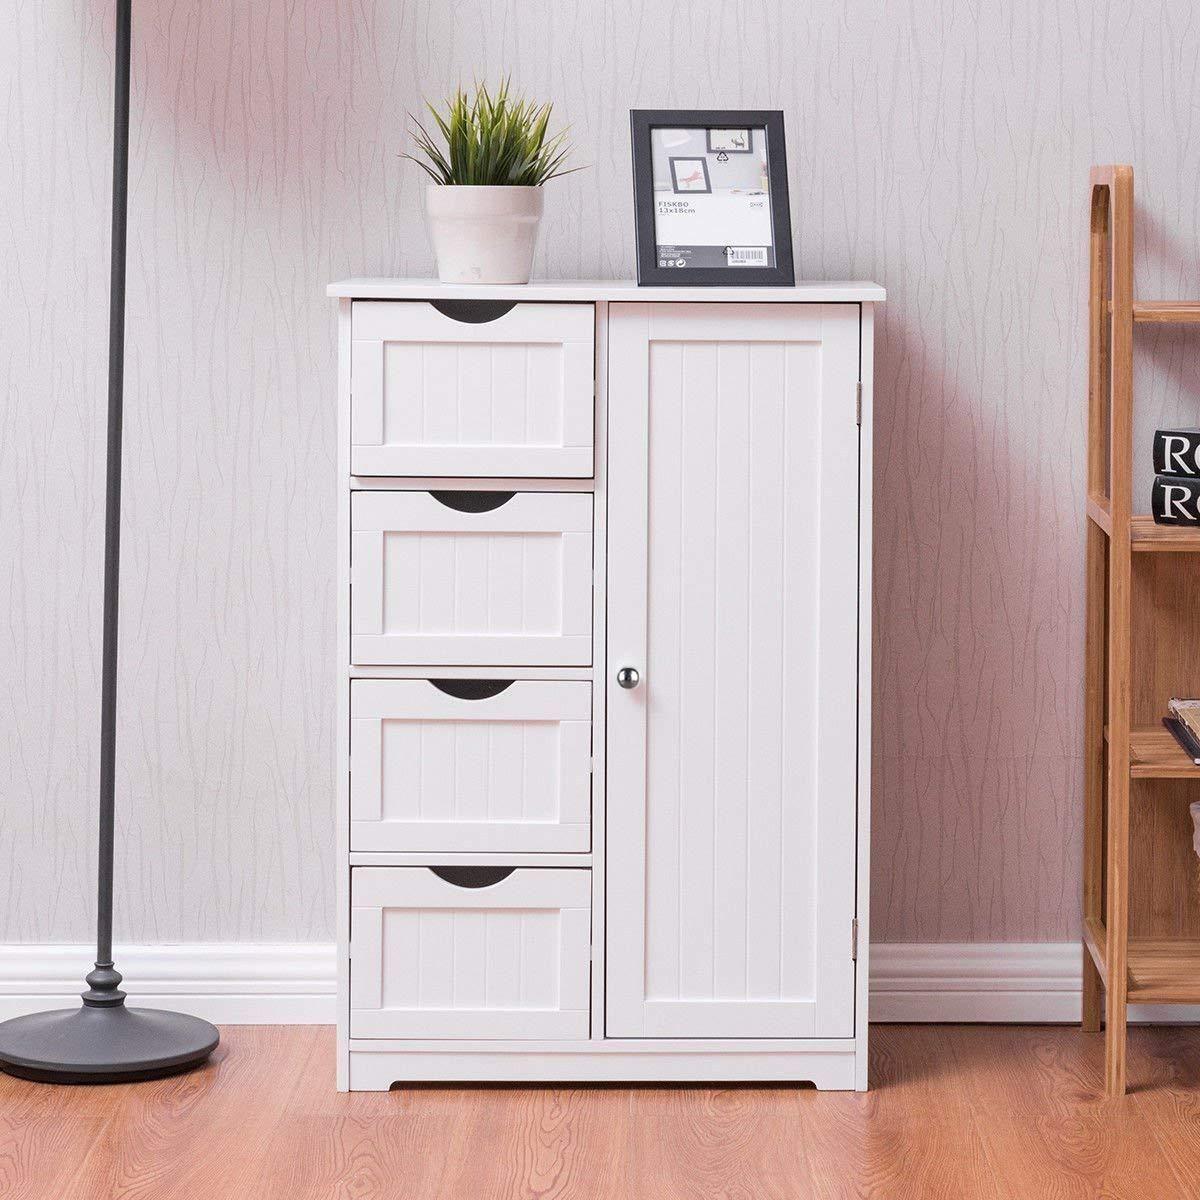 Home Bathroom Floor Cabinets Cupboard Storage Bathroom Standing Cabinet